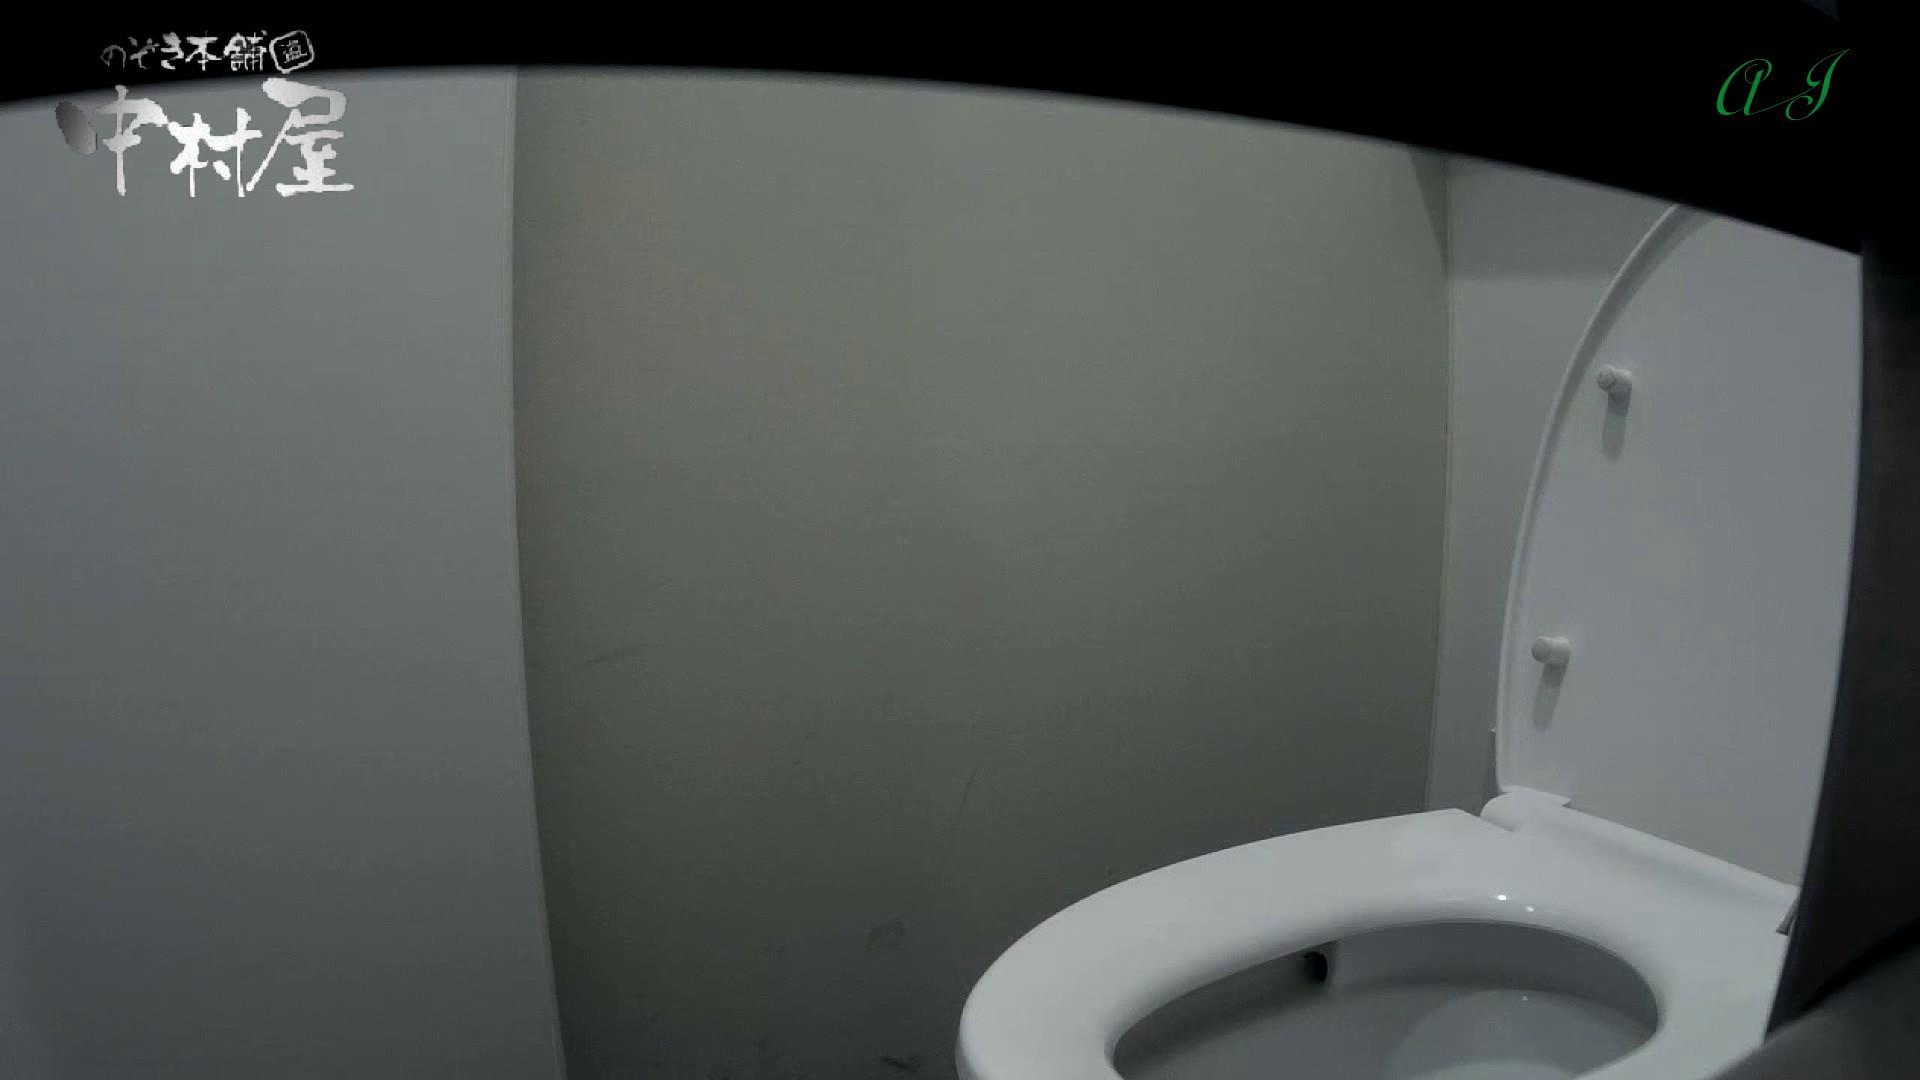 有名大学女性洗面所 vol.62 会話が弾む化粧室!! OLエロ画像 | 潜入  99PICs 91